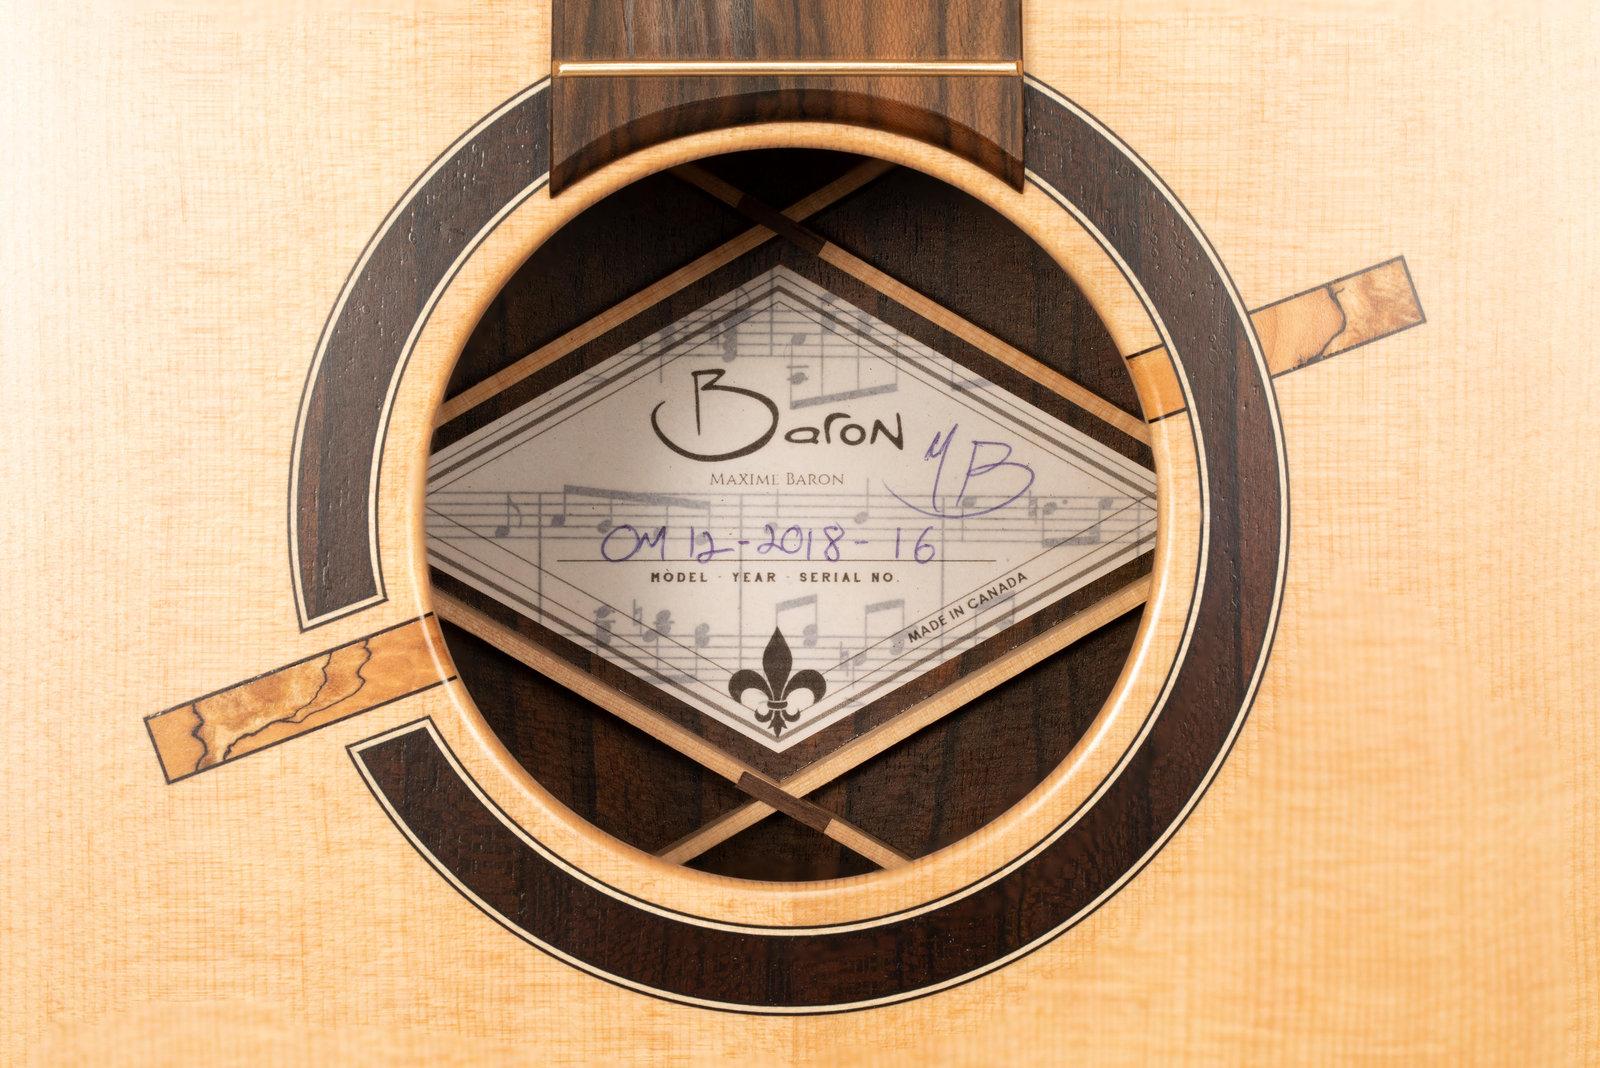 Guitare Baron 12 cordes (fabrication en cours) - Page 2 191212024219955376